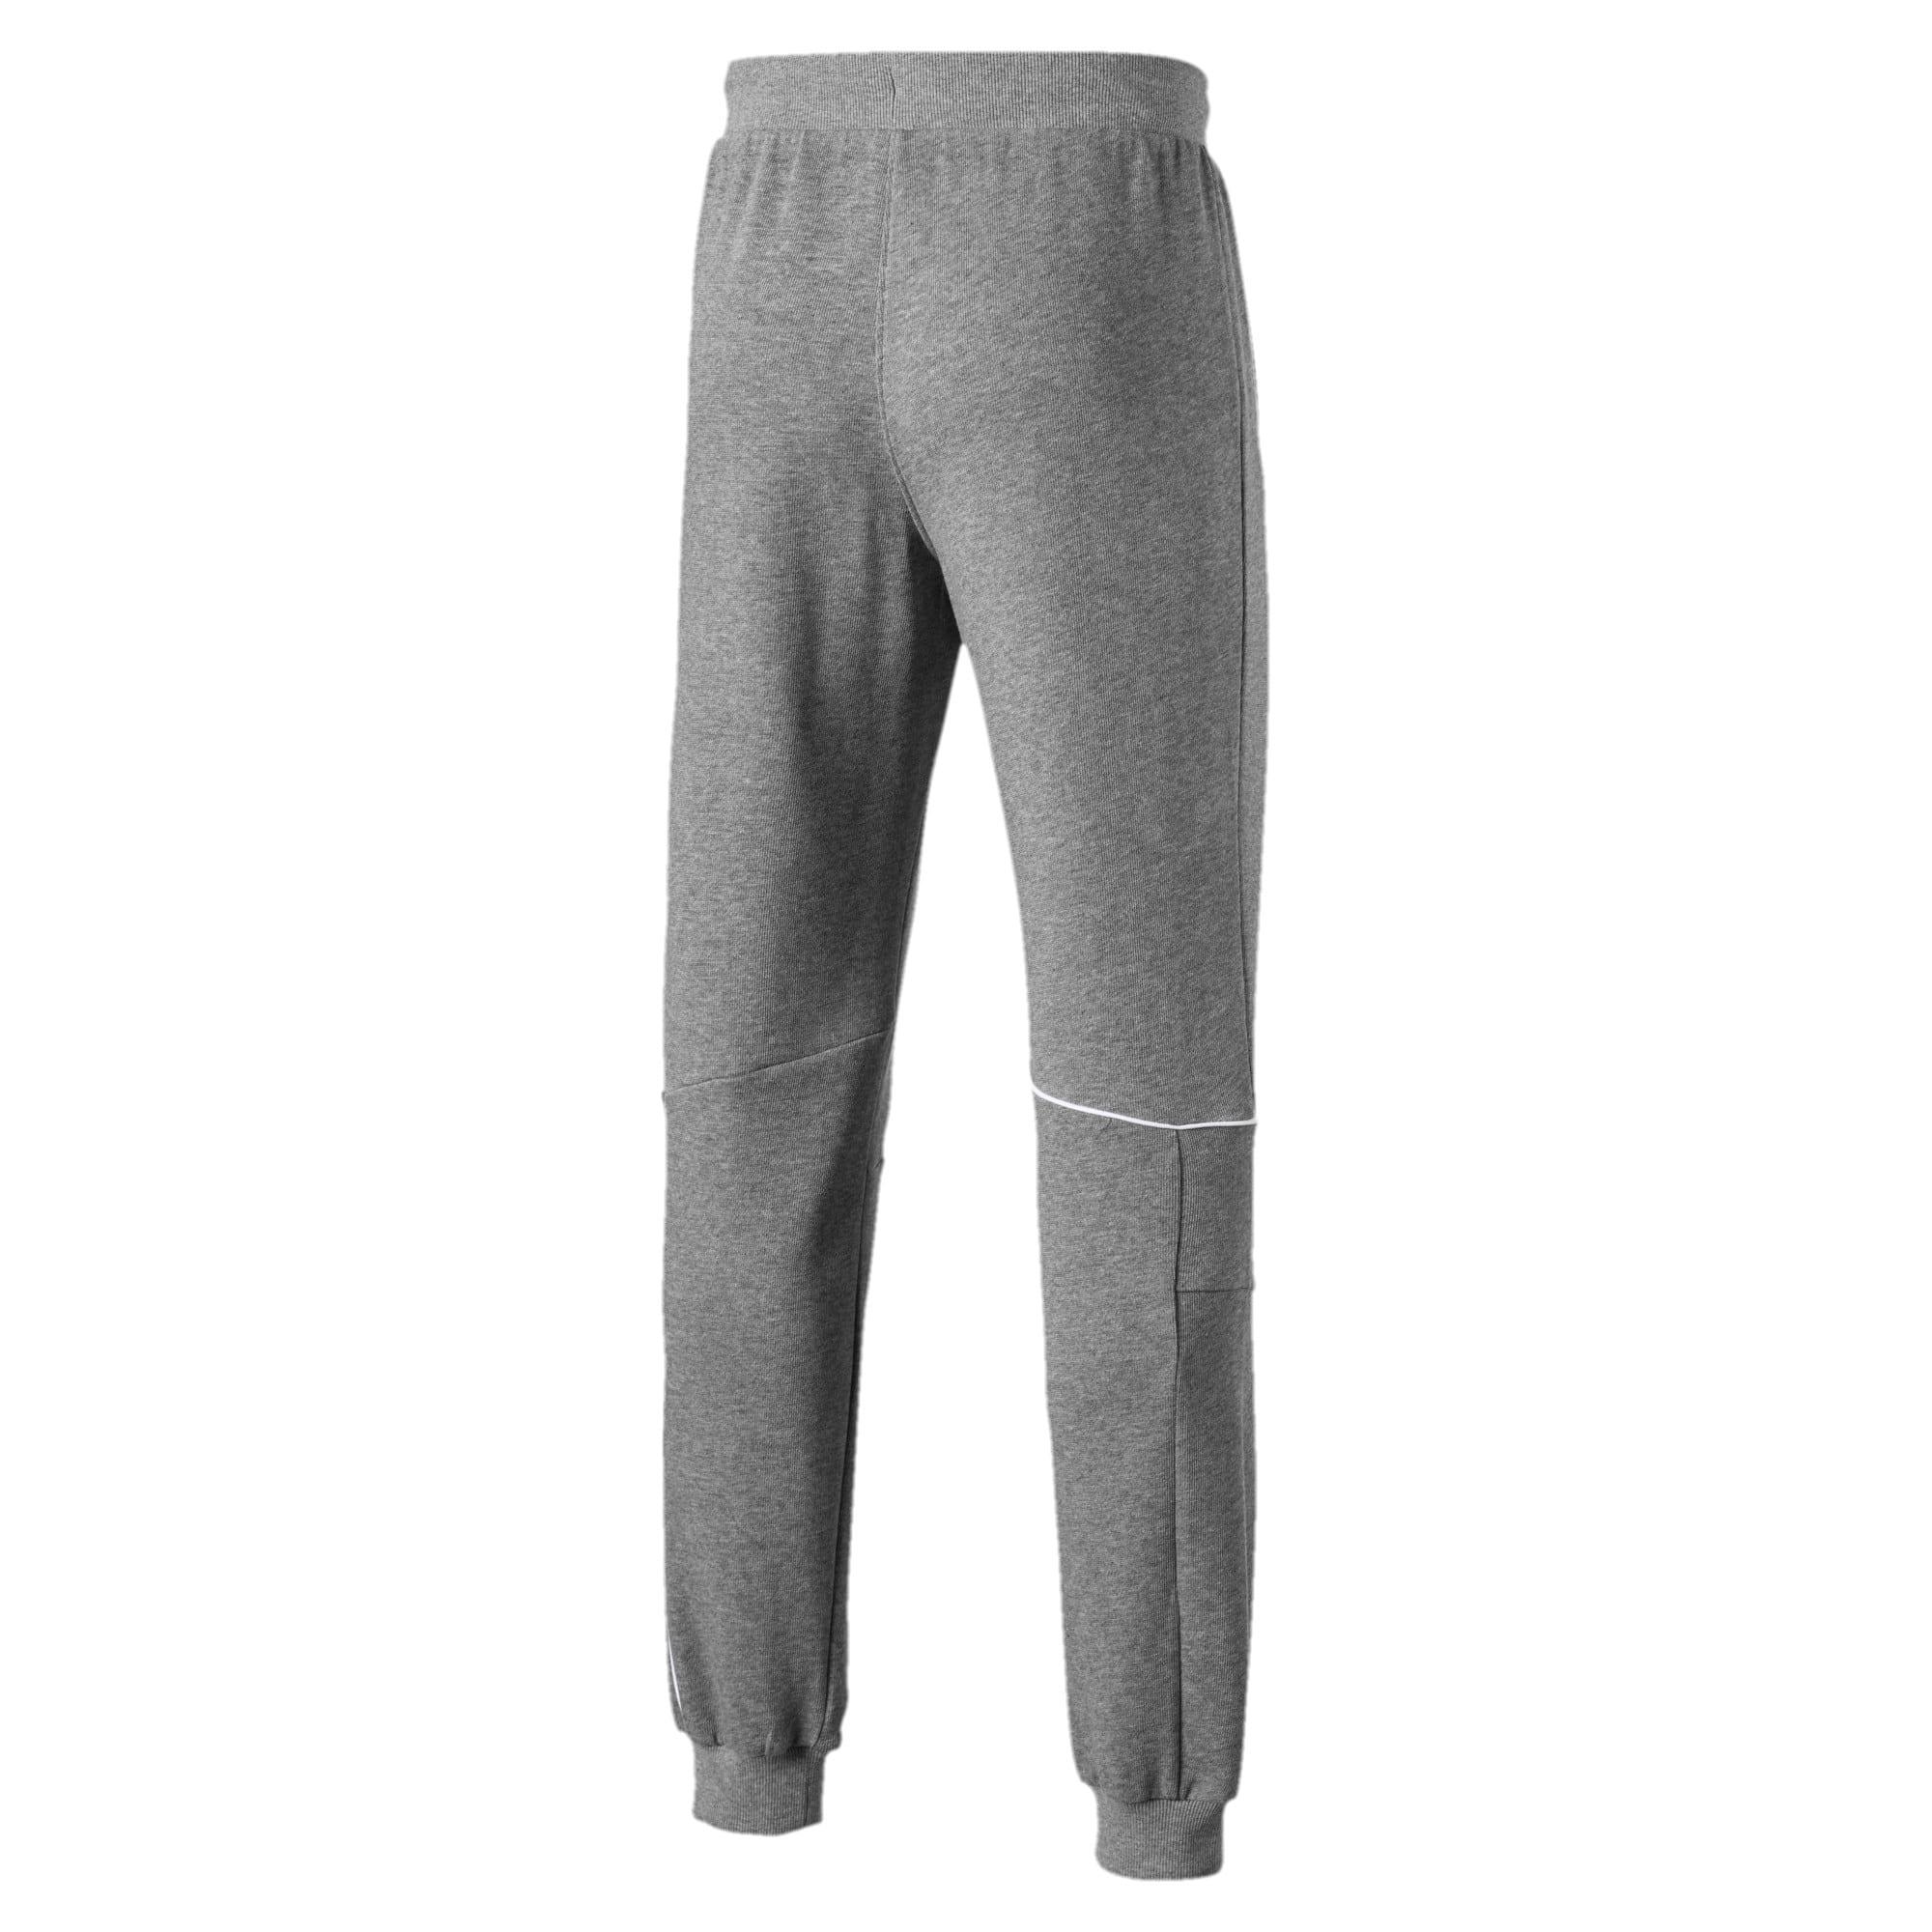 Thumbnail 5 of Pantalon en sweat en maille Ferrari pour homme, Medium Gray Heather, medium